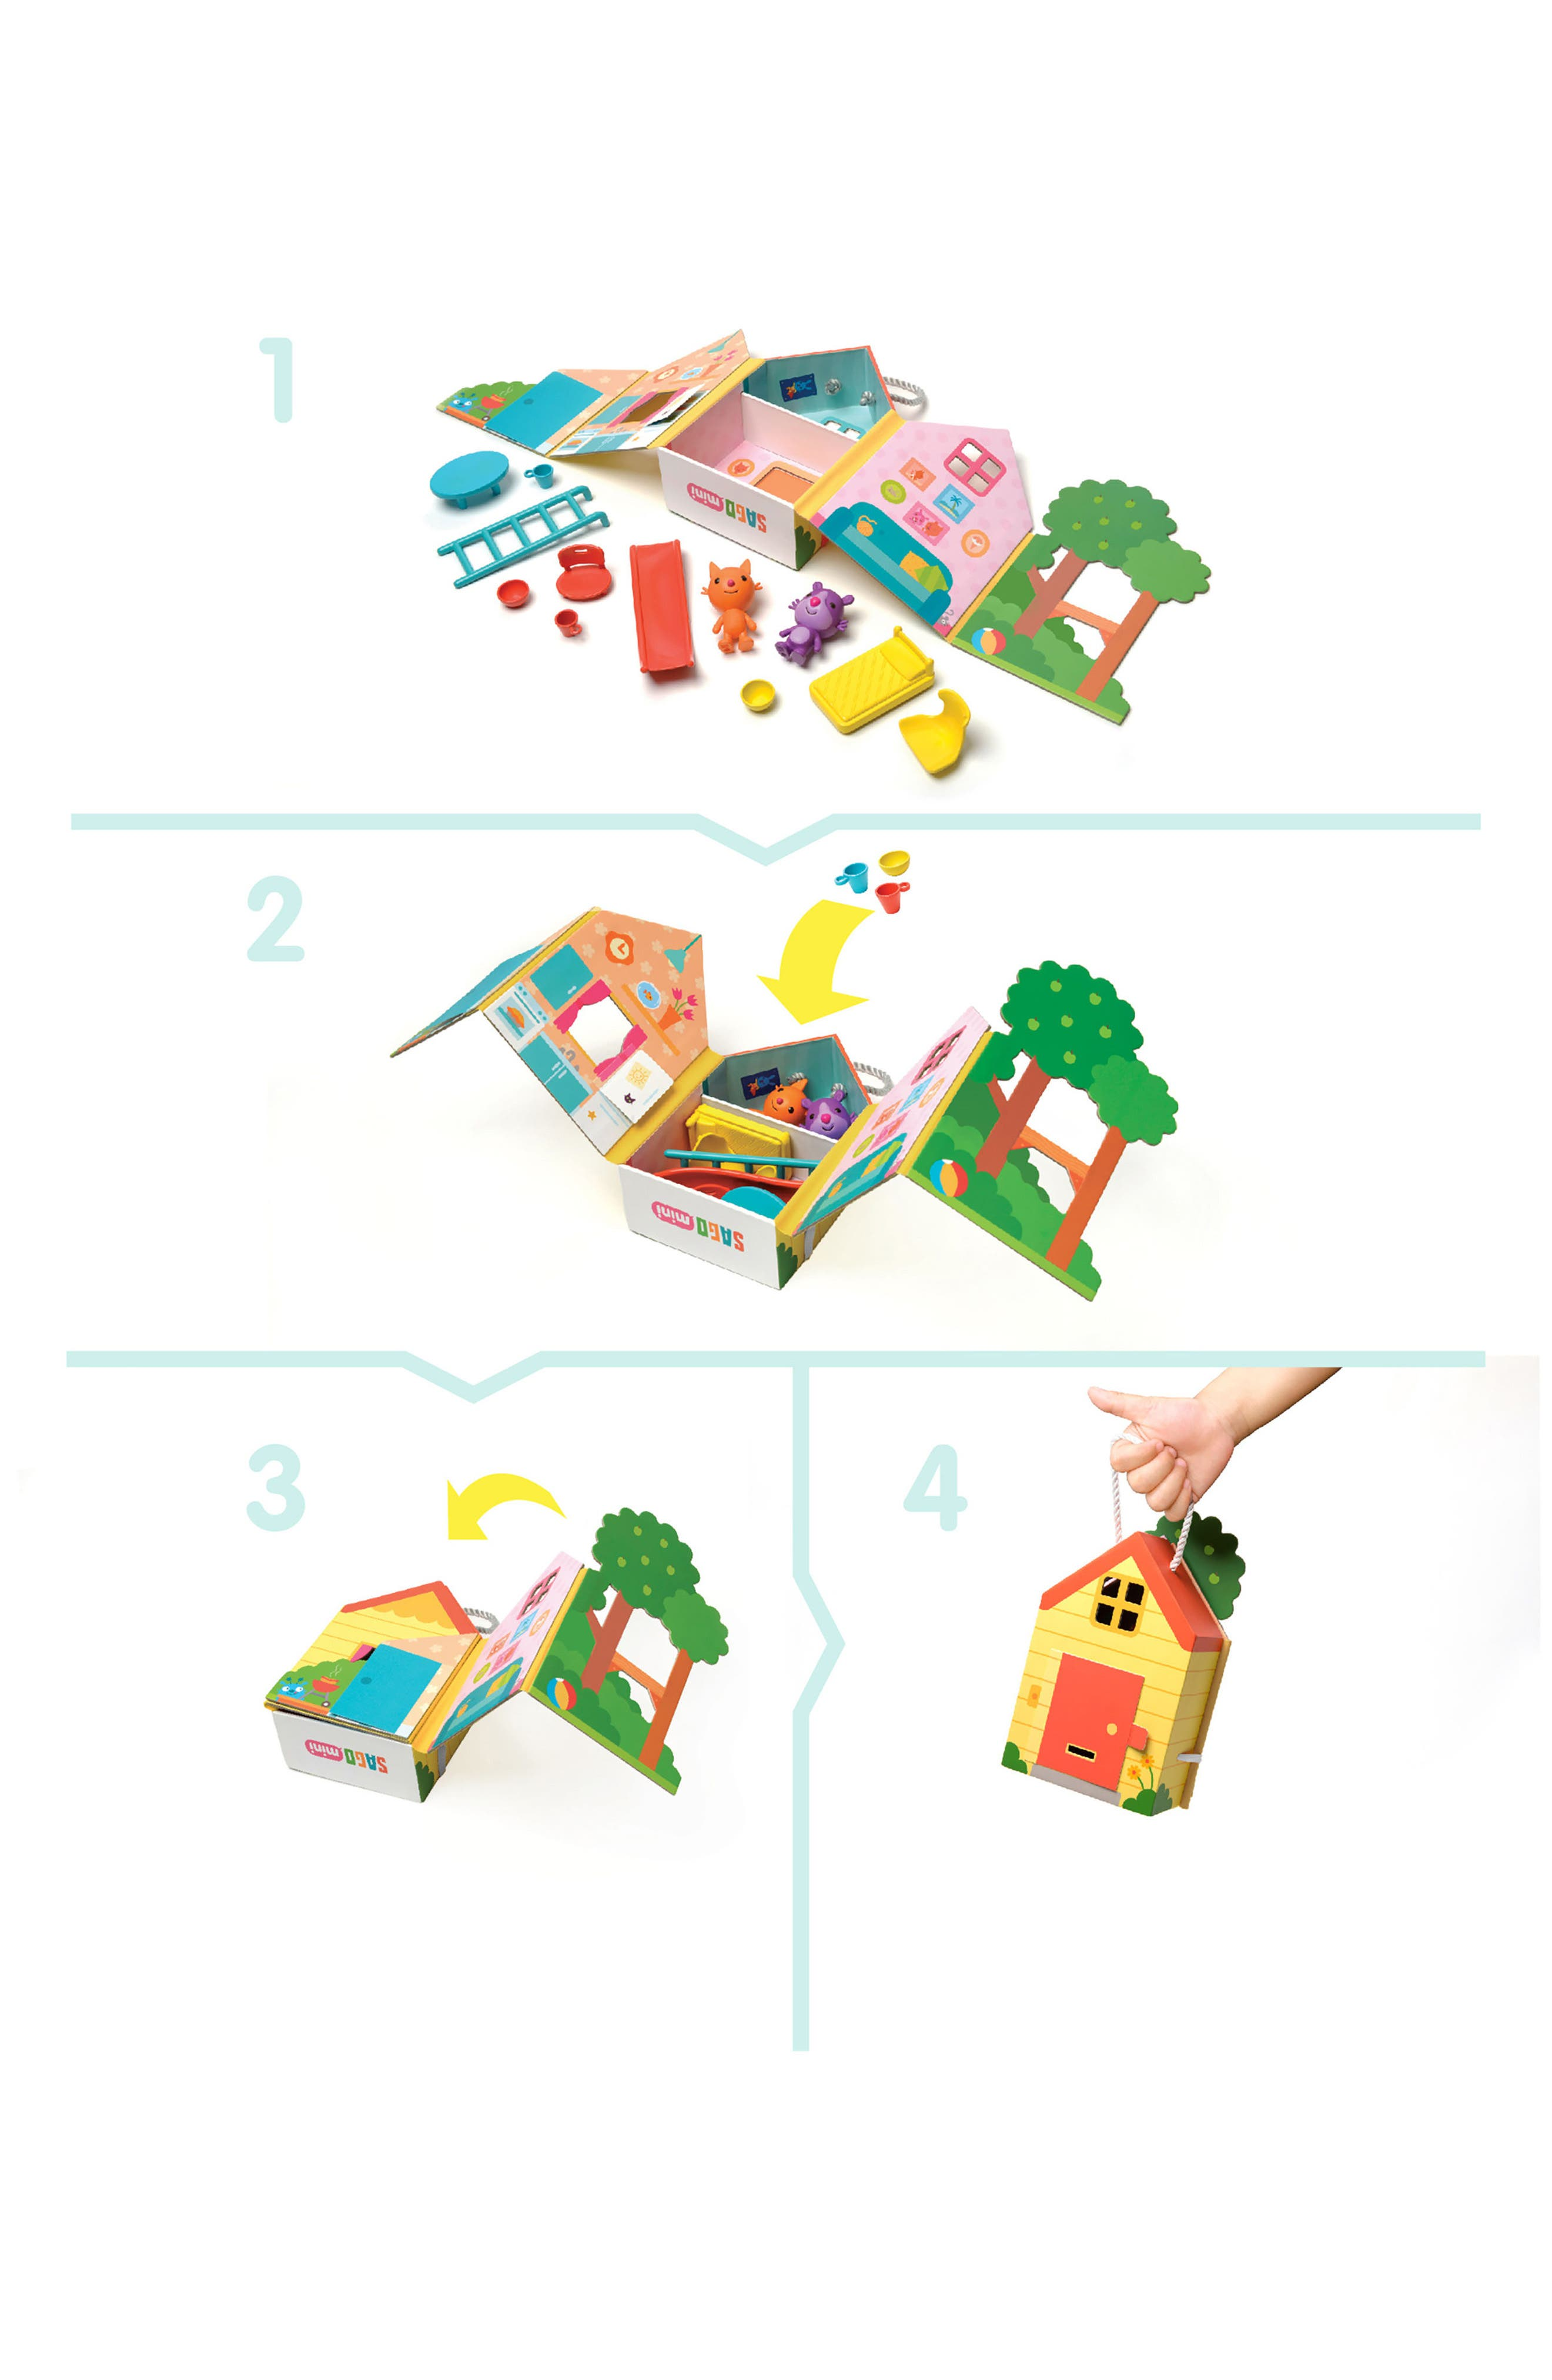 Jinja's House Portable Play Set,                             Alternate thumbnail 4, color,                             800